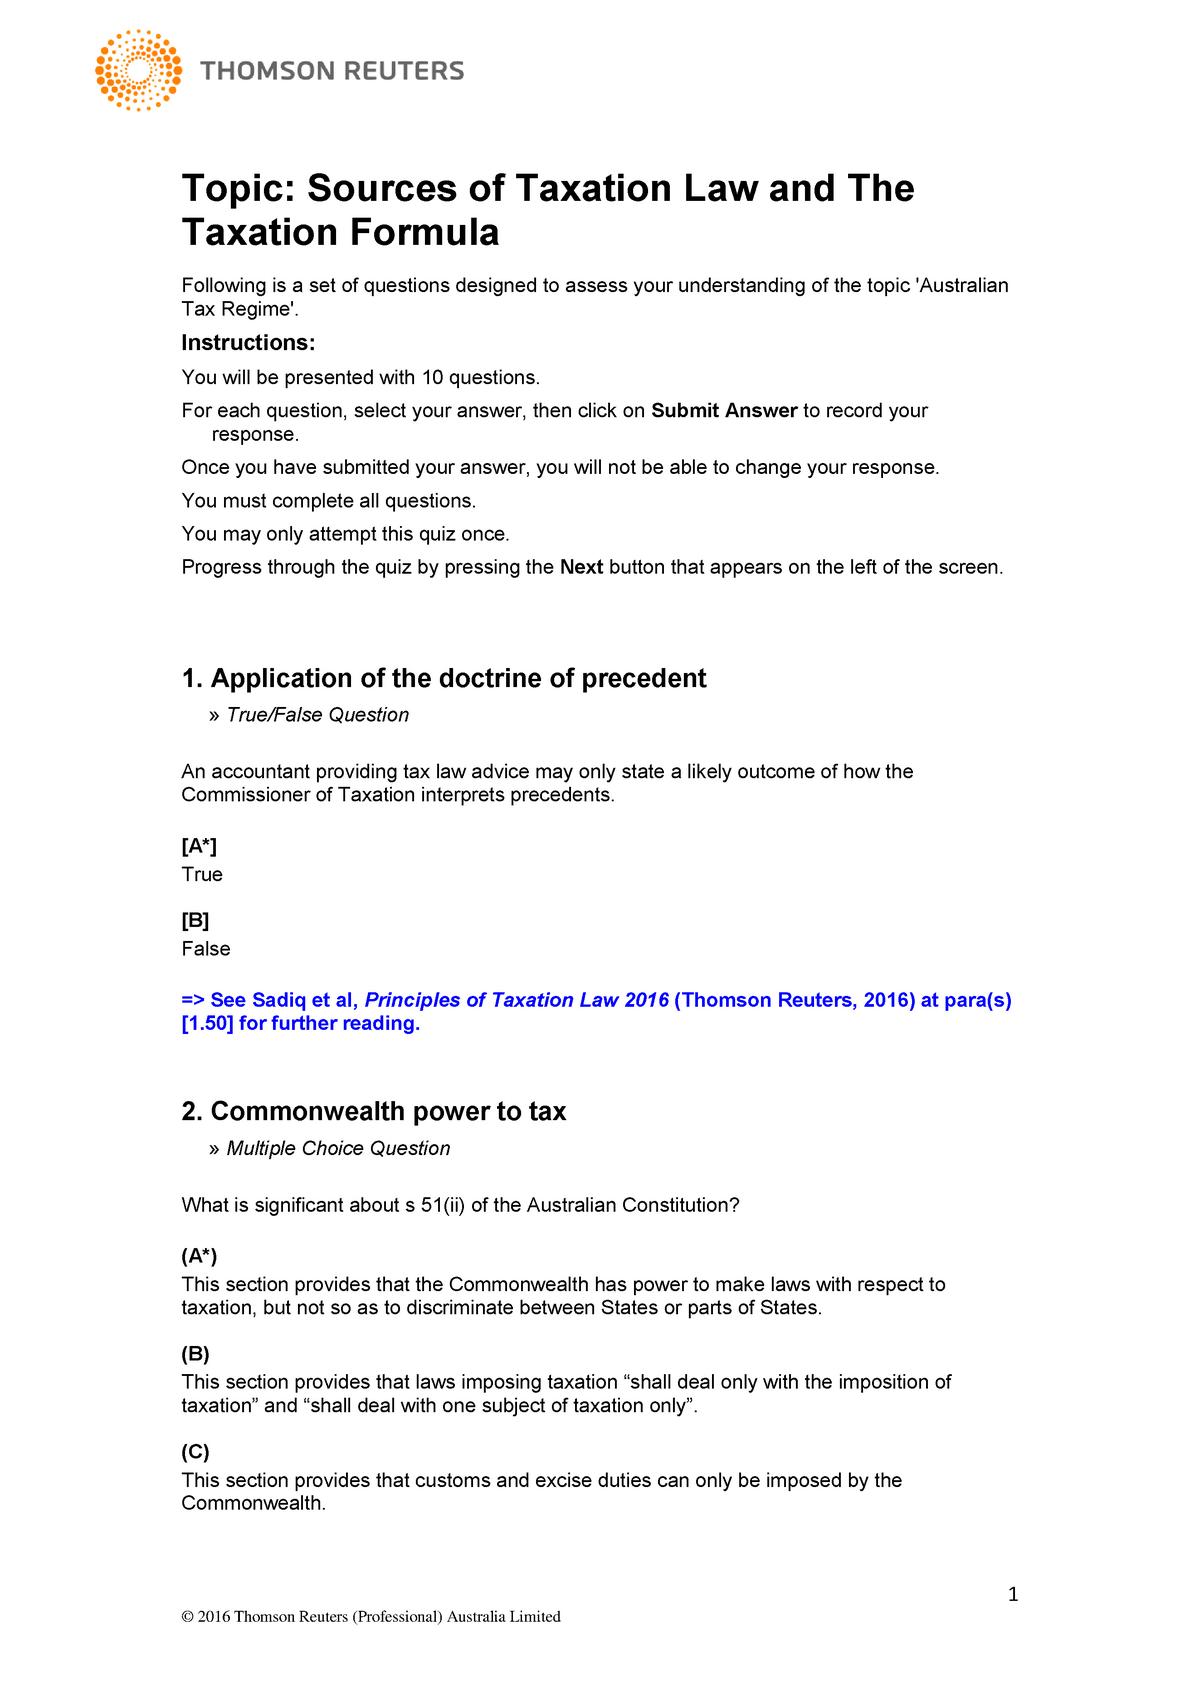 Practical - BLAW30002 Taxation Law I - Unimelb - StuDocu